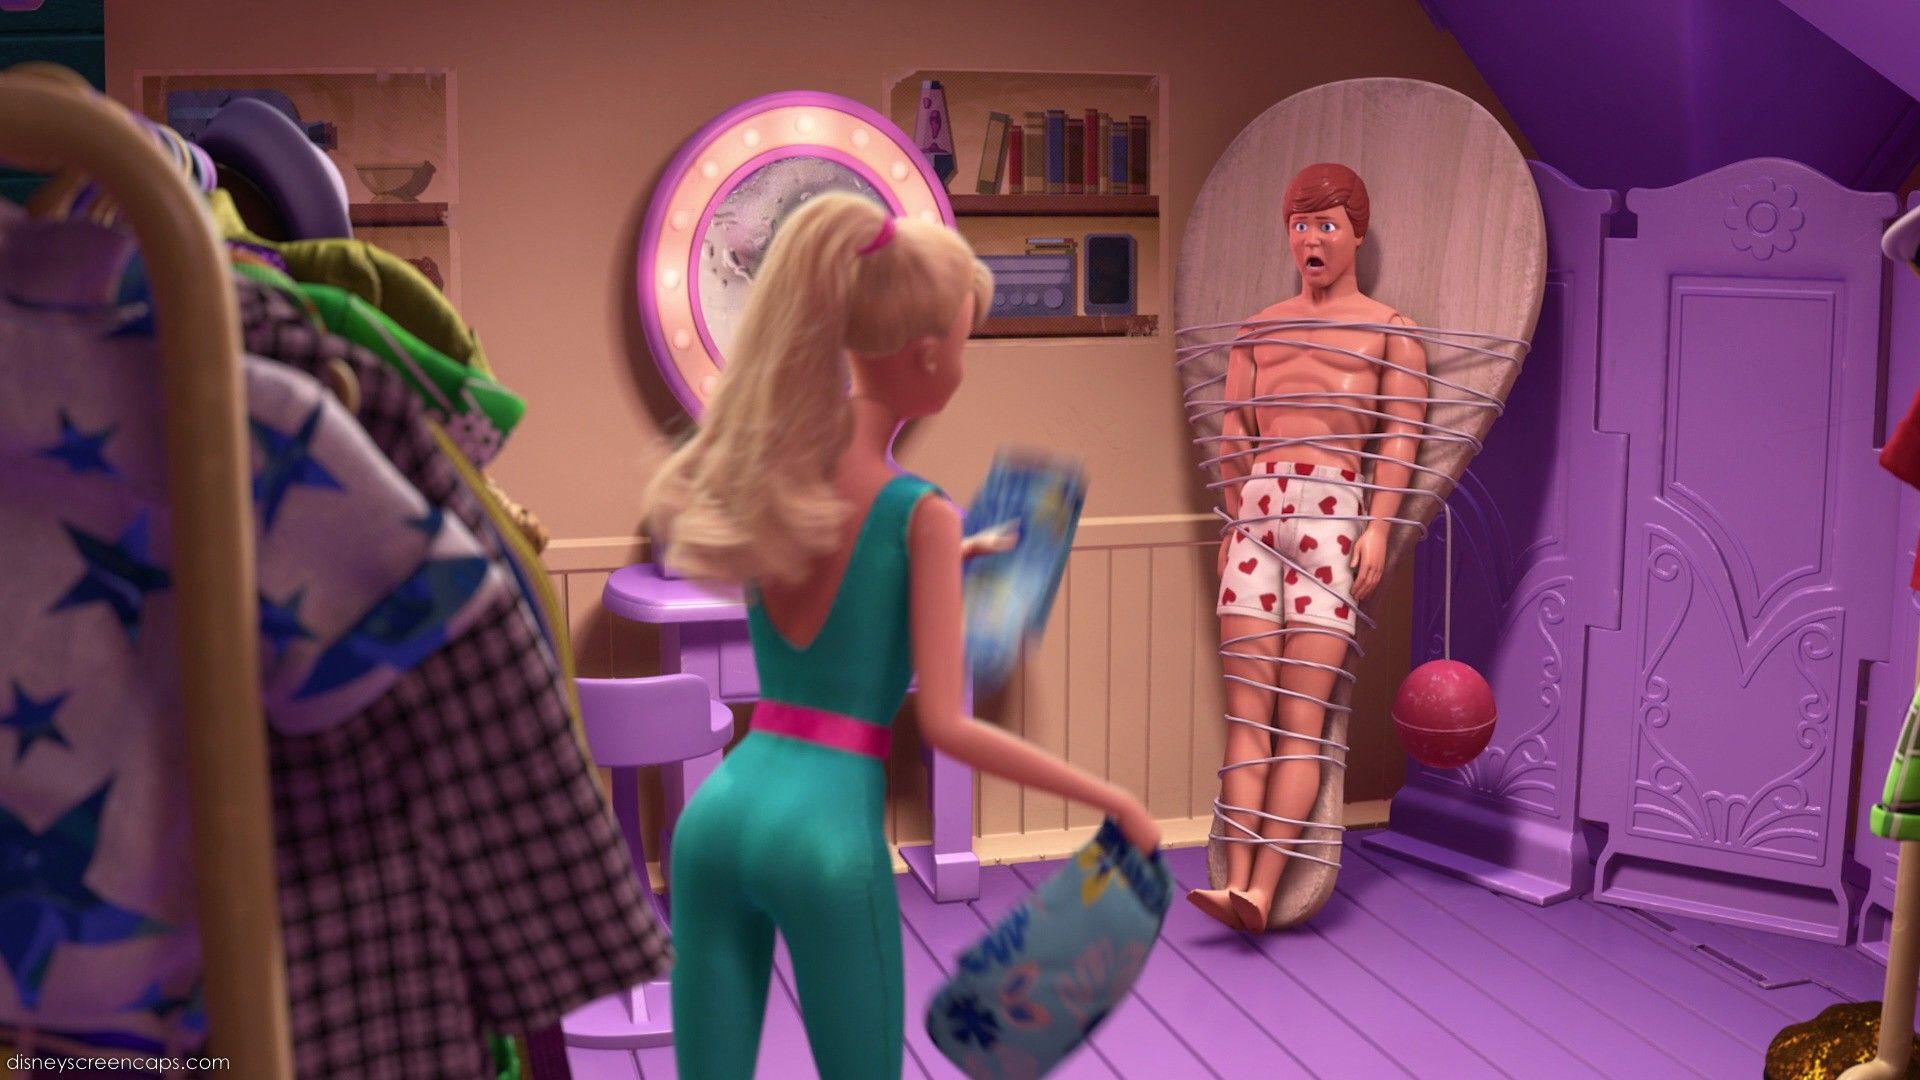 barbie kissing games for girls